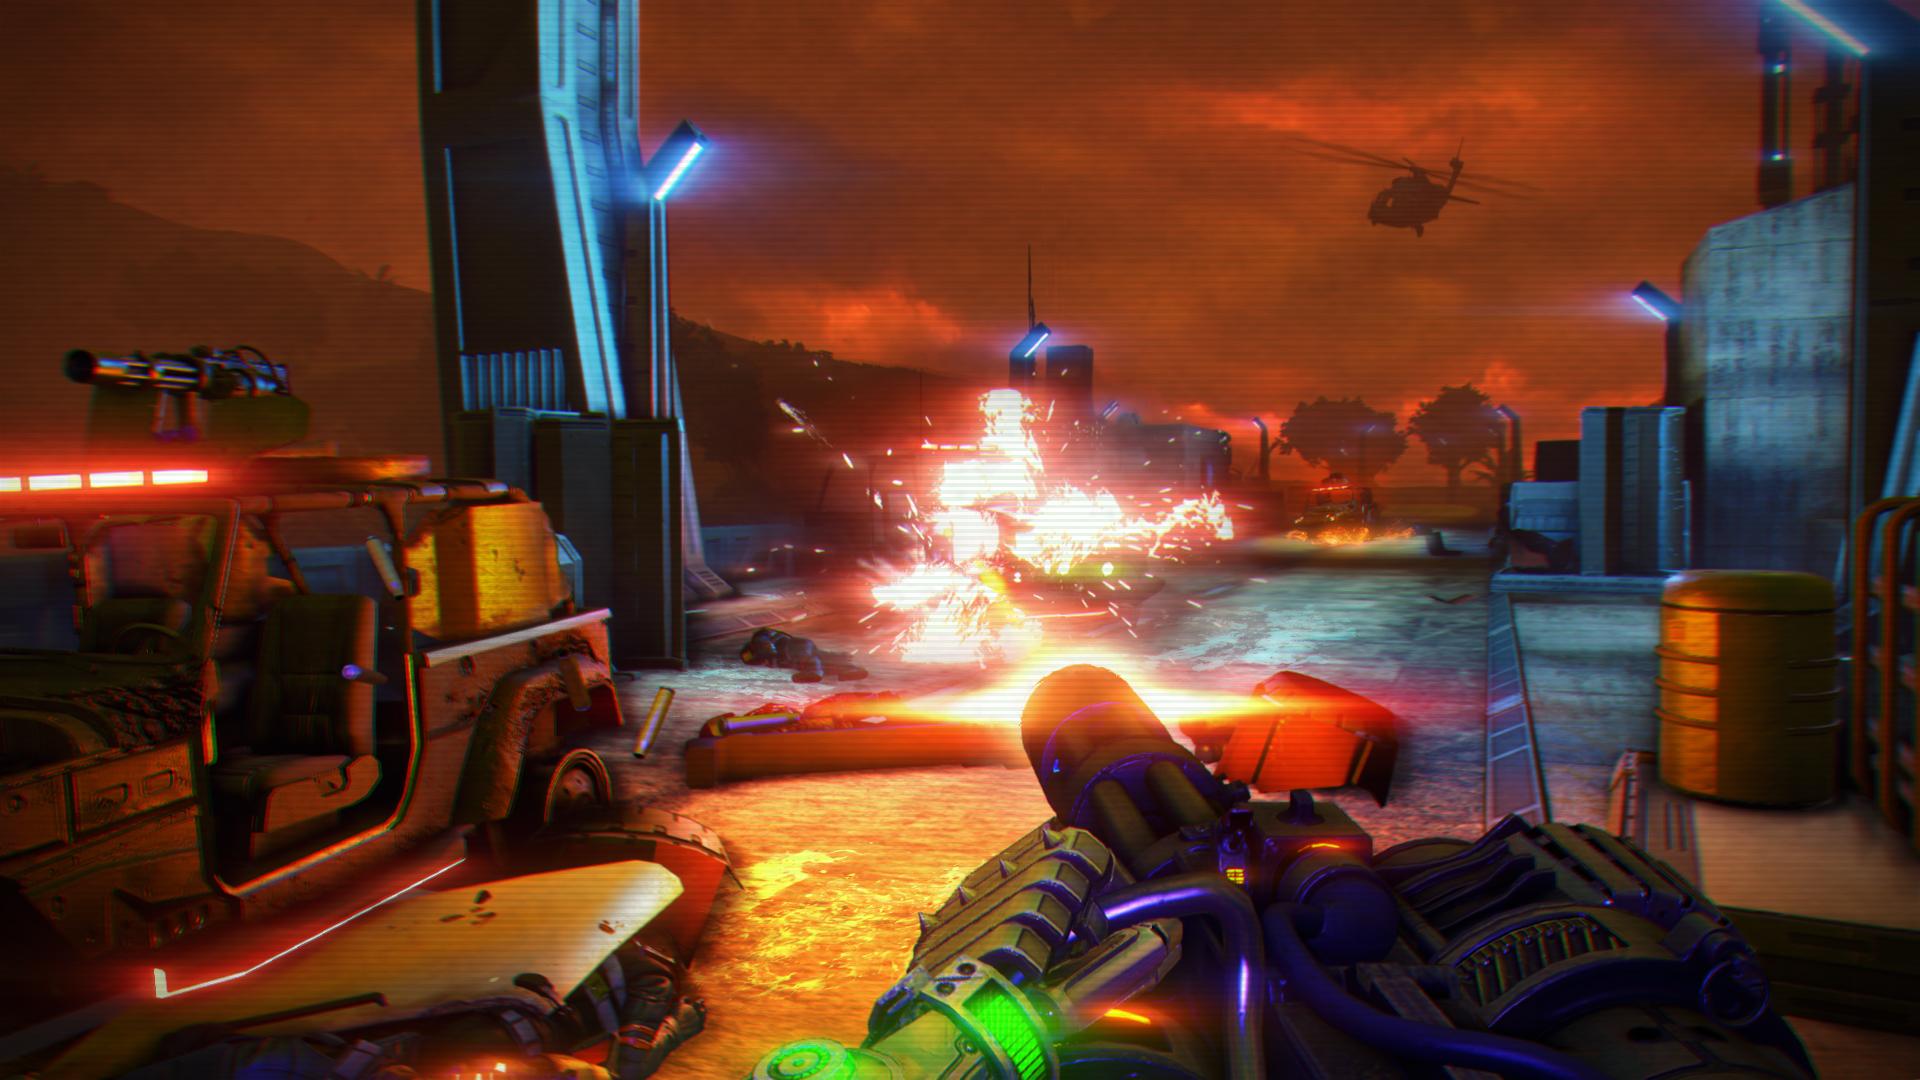 La próxima semana podrán obtener Far Cry 3: Blood Dragon completamente gratis